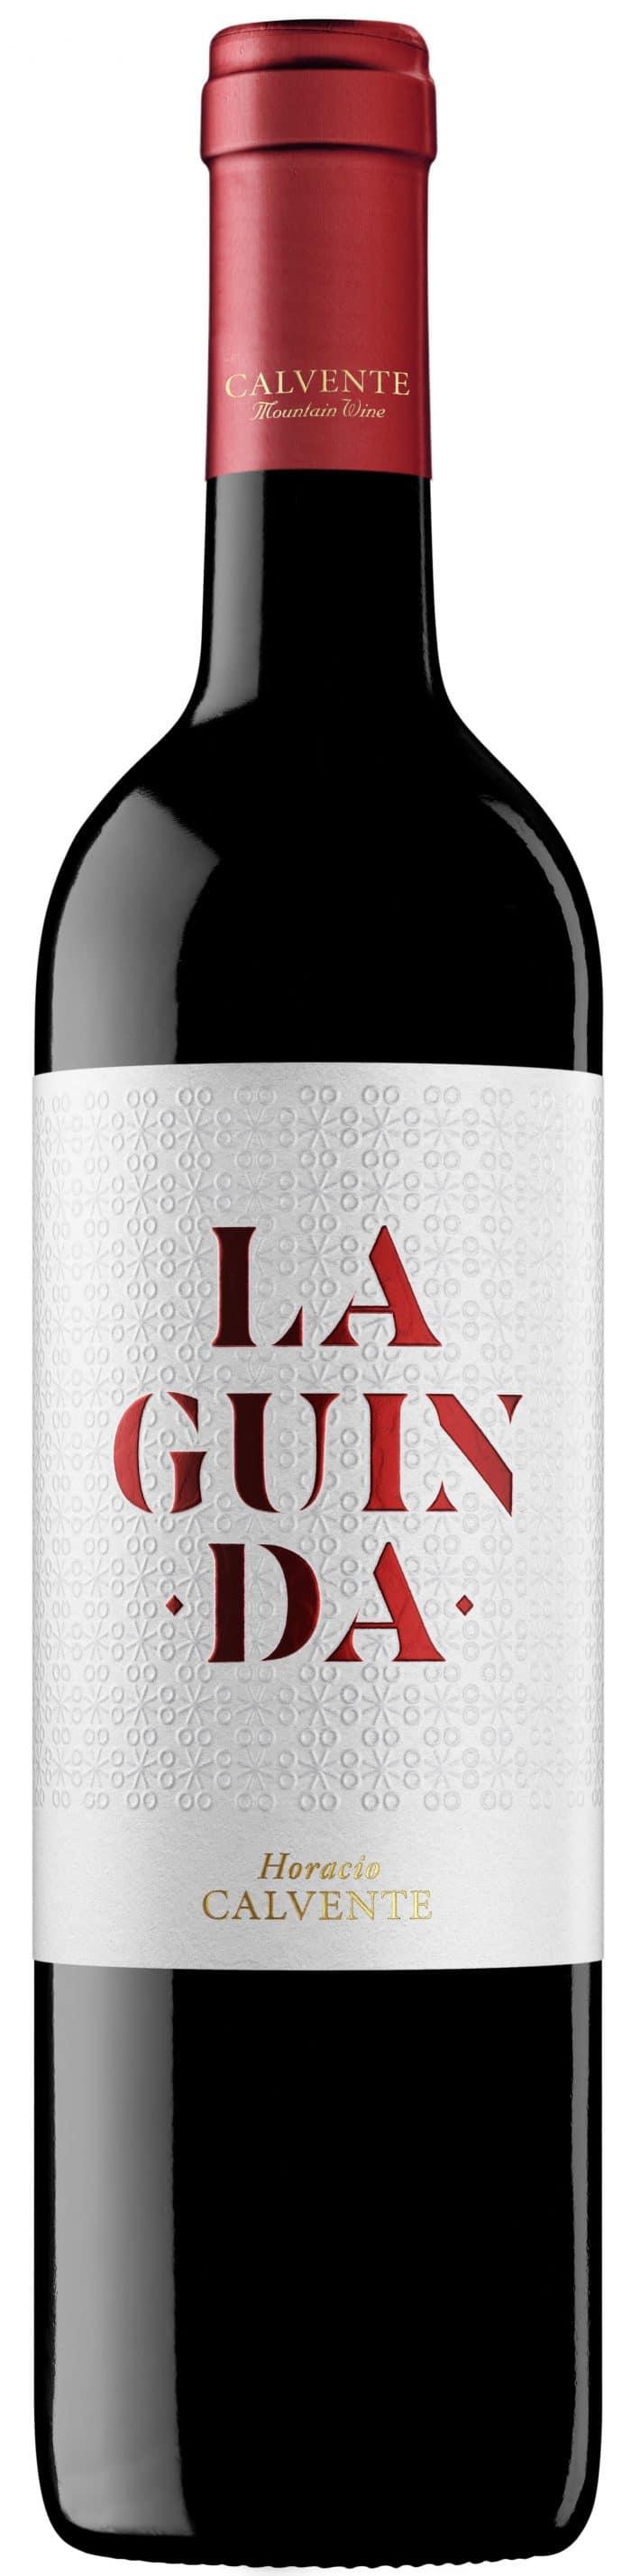 Calvente Laguin-da | Spanje | gemaakt van de druif: Cabernet Sauvignon, Merlot, Petit Verdot, Syrah, Tempranillo